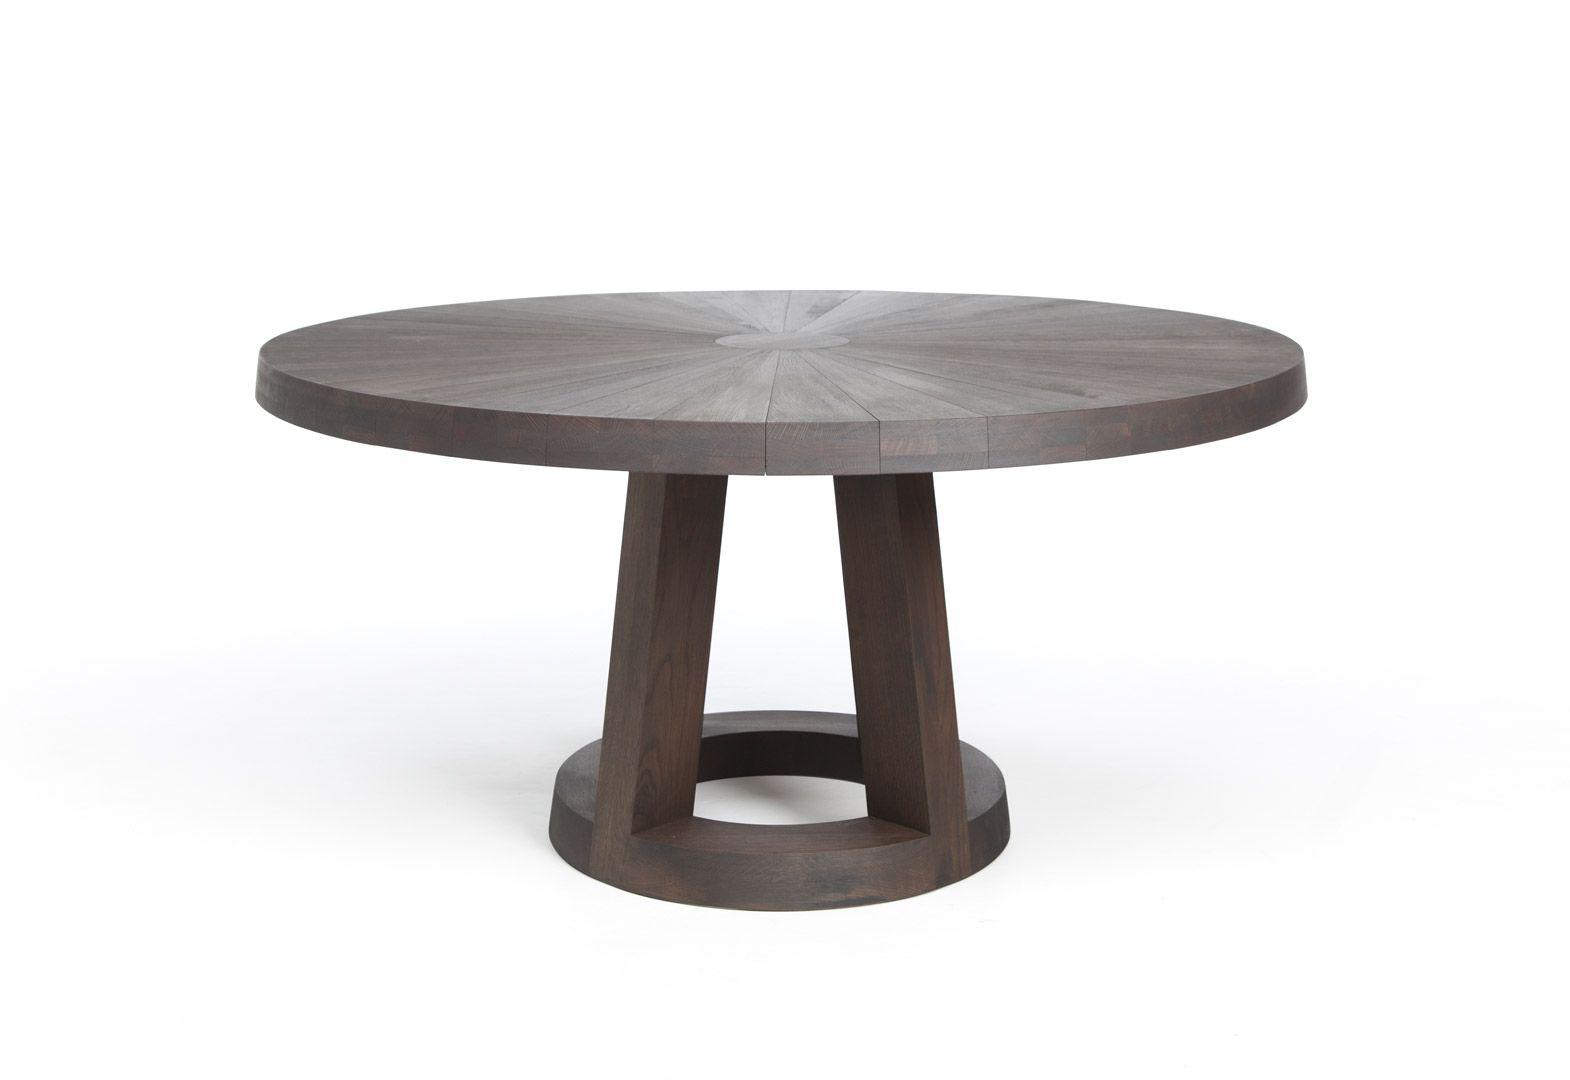 Tafel Remy Meijers : Ronde eettafel hout solid van ontwerper remy meijers